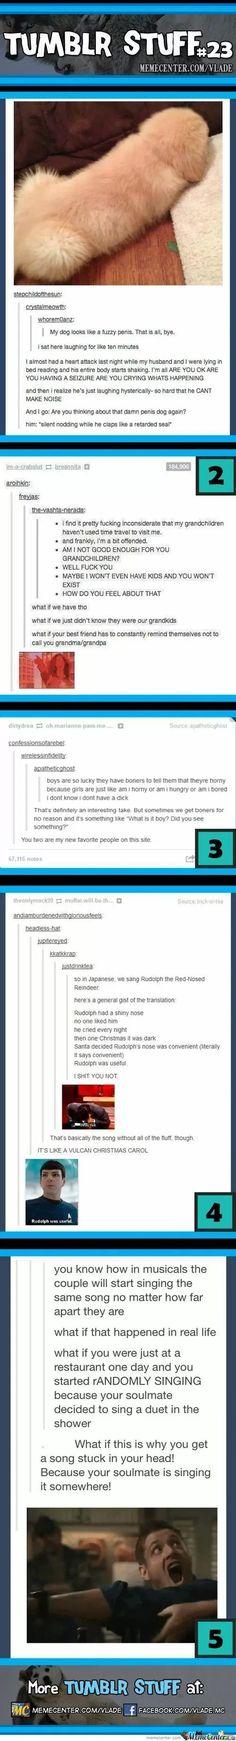 Tumblr Stuff #23